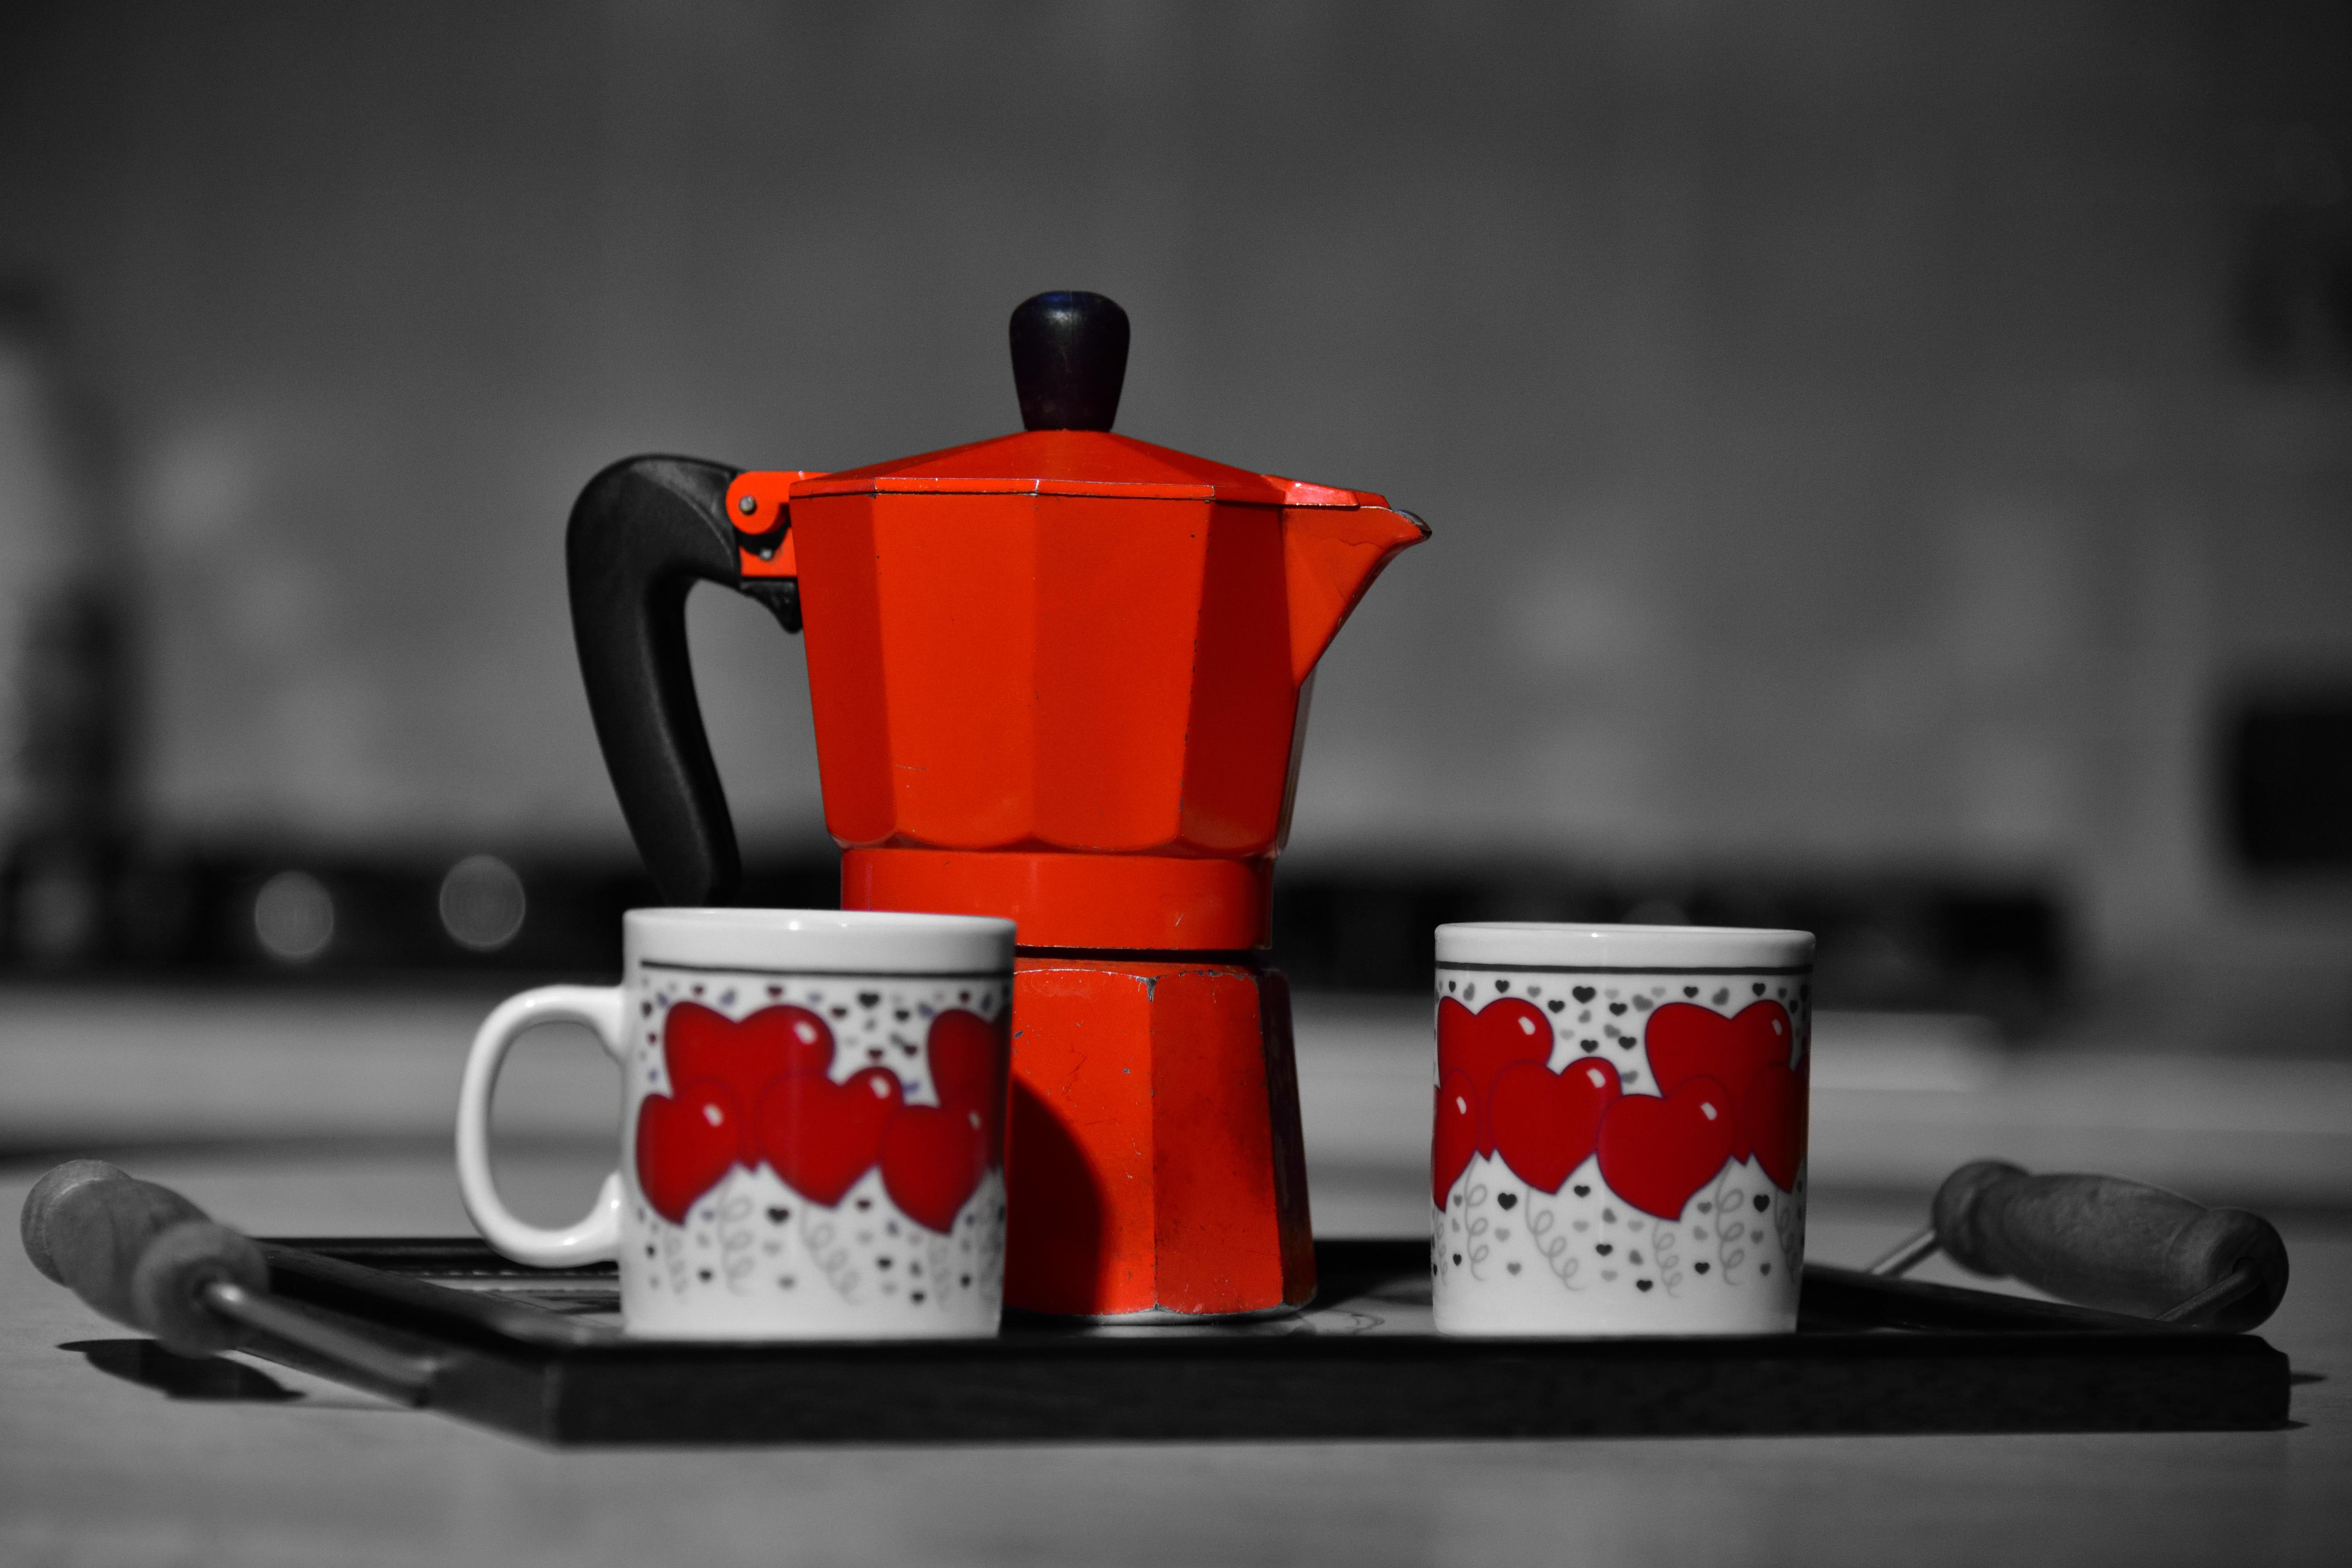 kostenlose foto kaffee rot getr nk fr hst ck bialetti stillleben fotografie moka. Black Bedroom Furniture Sets. Home Design Ideas